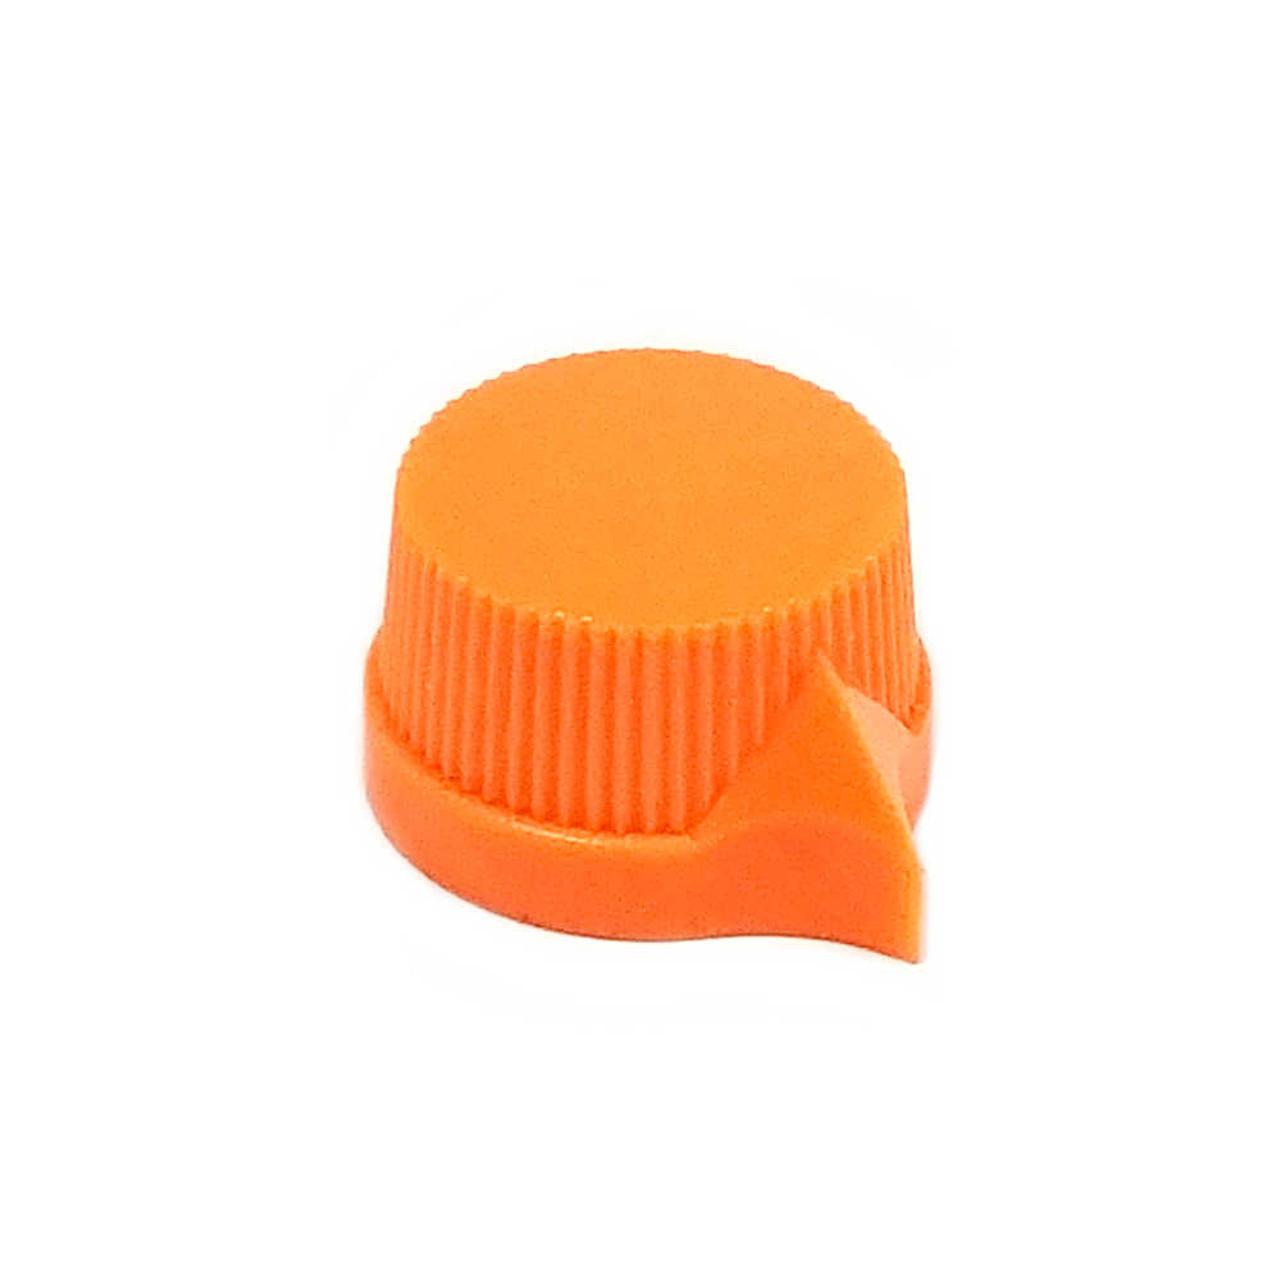 Davies Style 1400 Knob - Orange